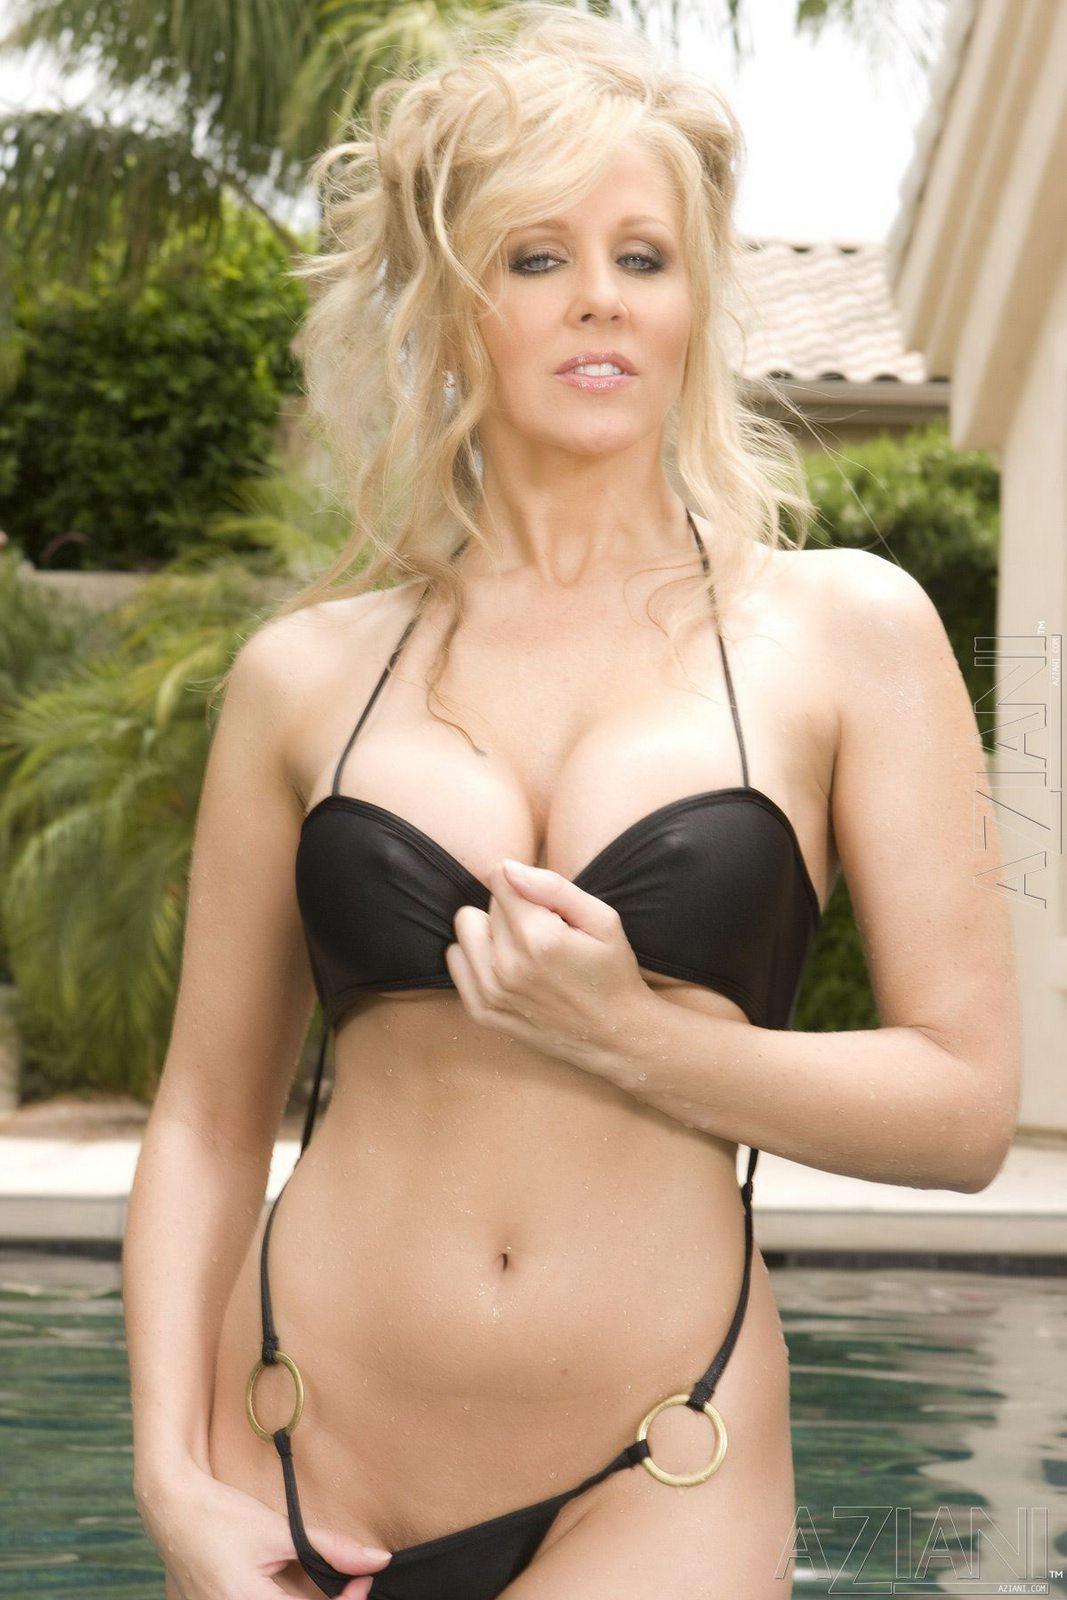 mypornstarbook net pornstars j julia ann gallery70 04